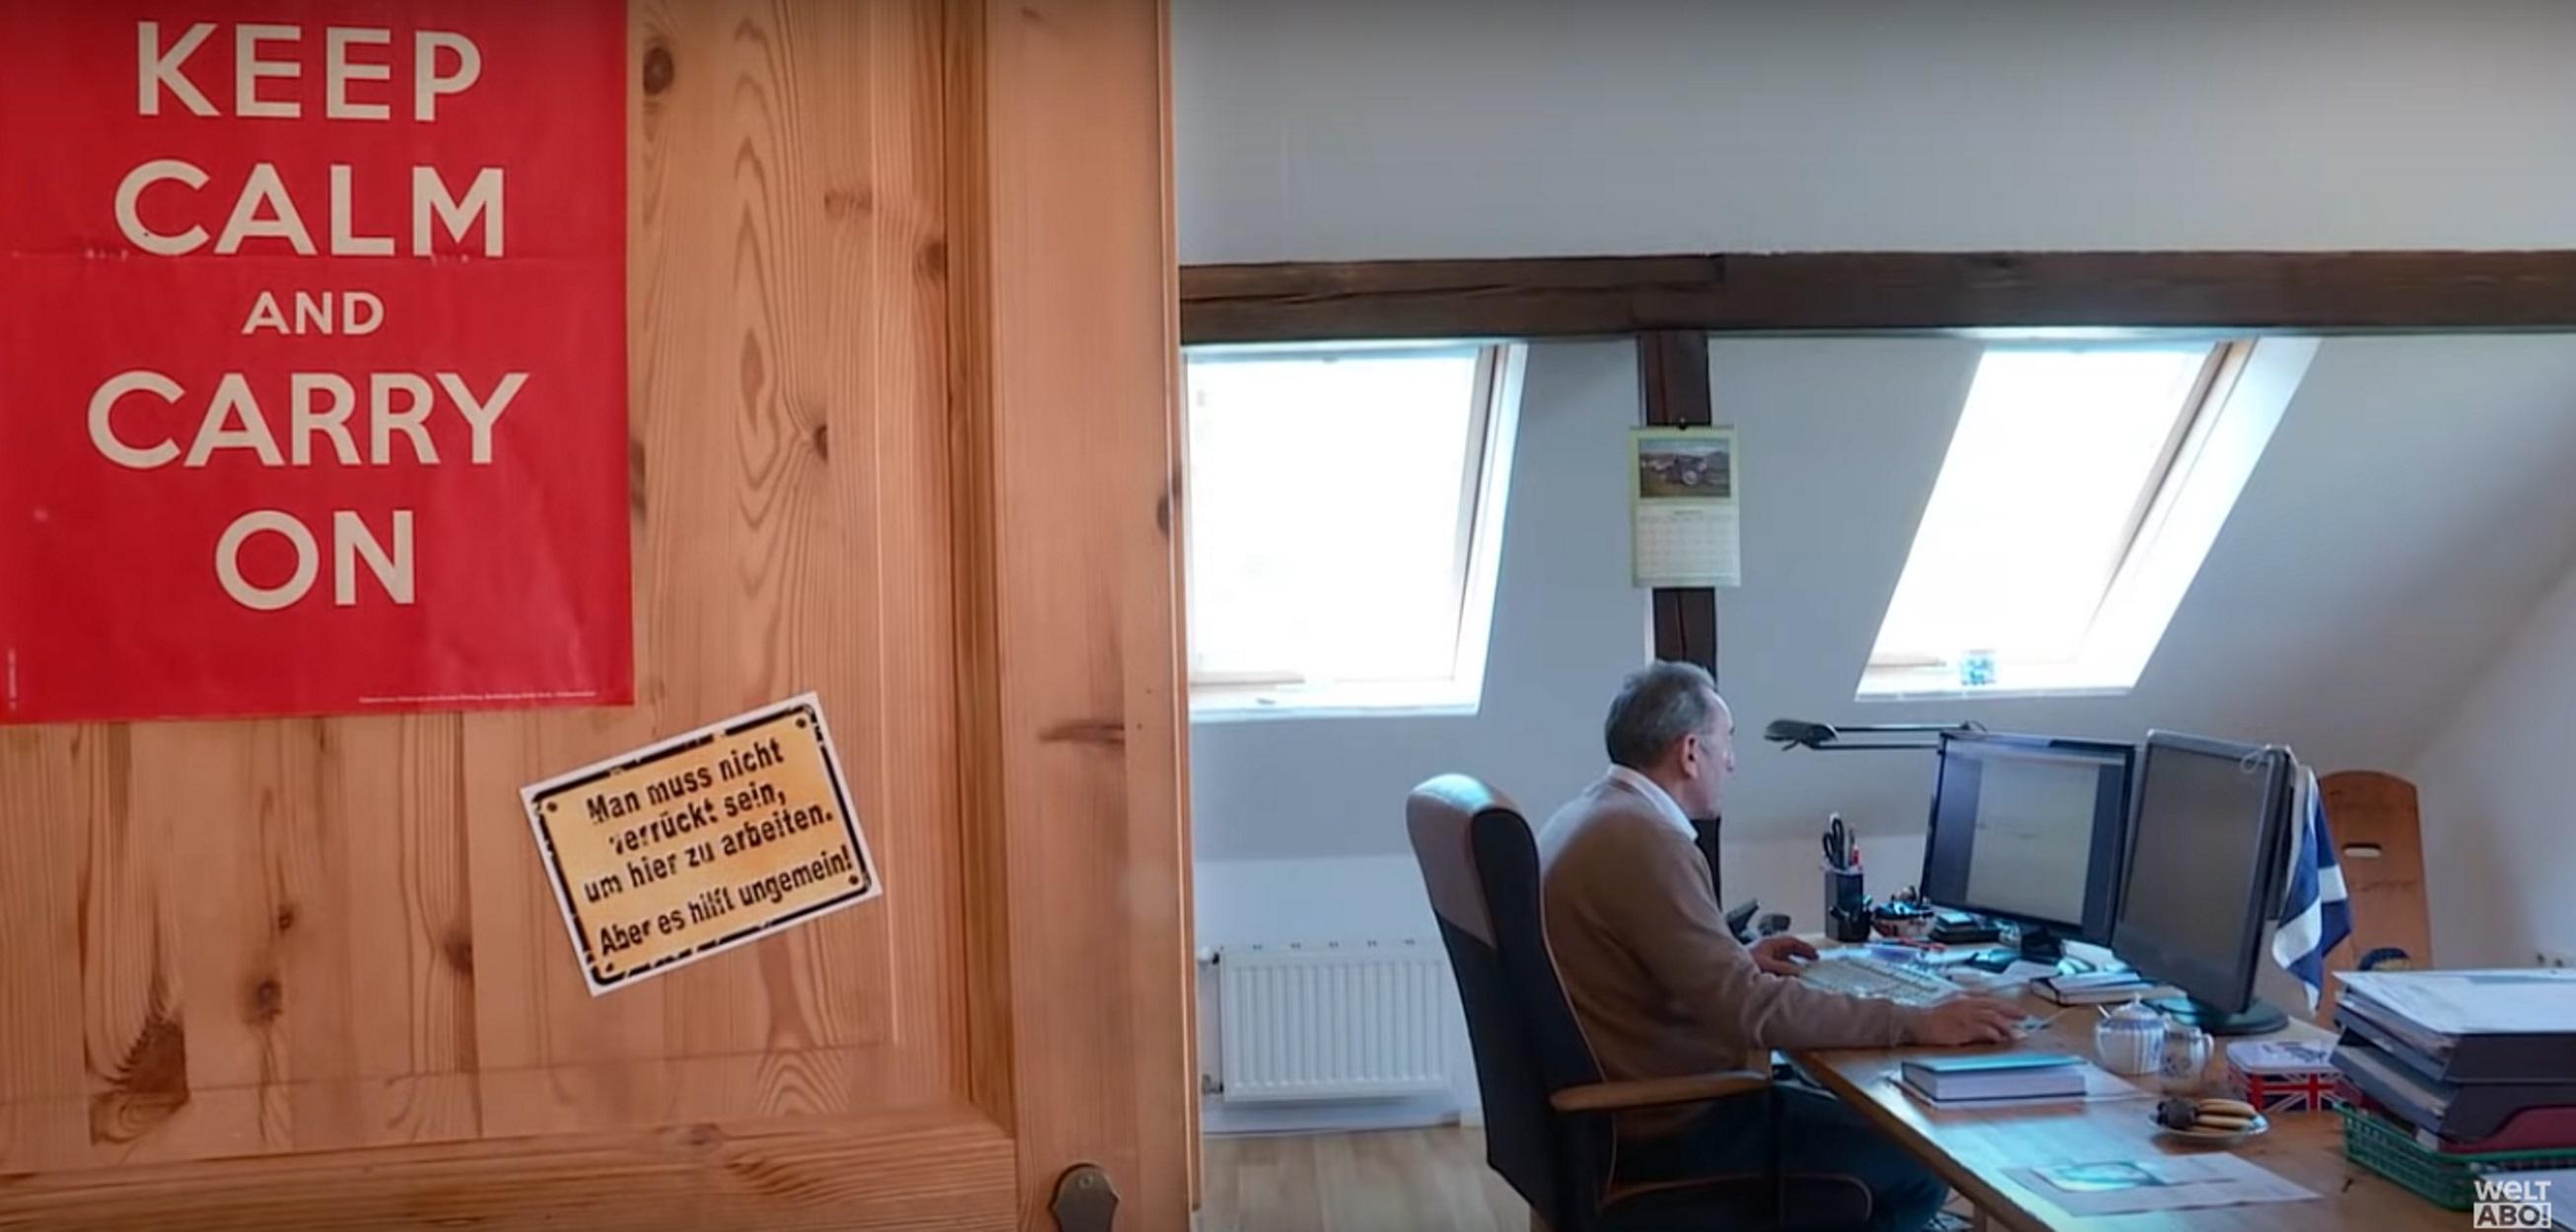 Brexit: Σκωτσέζος δήμαρχος στη Γερμανία έχασε το αξίωμά του!